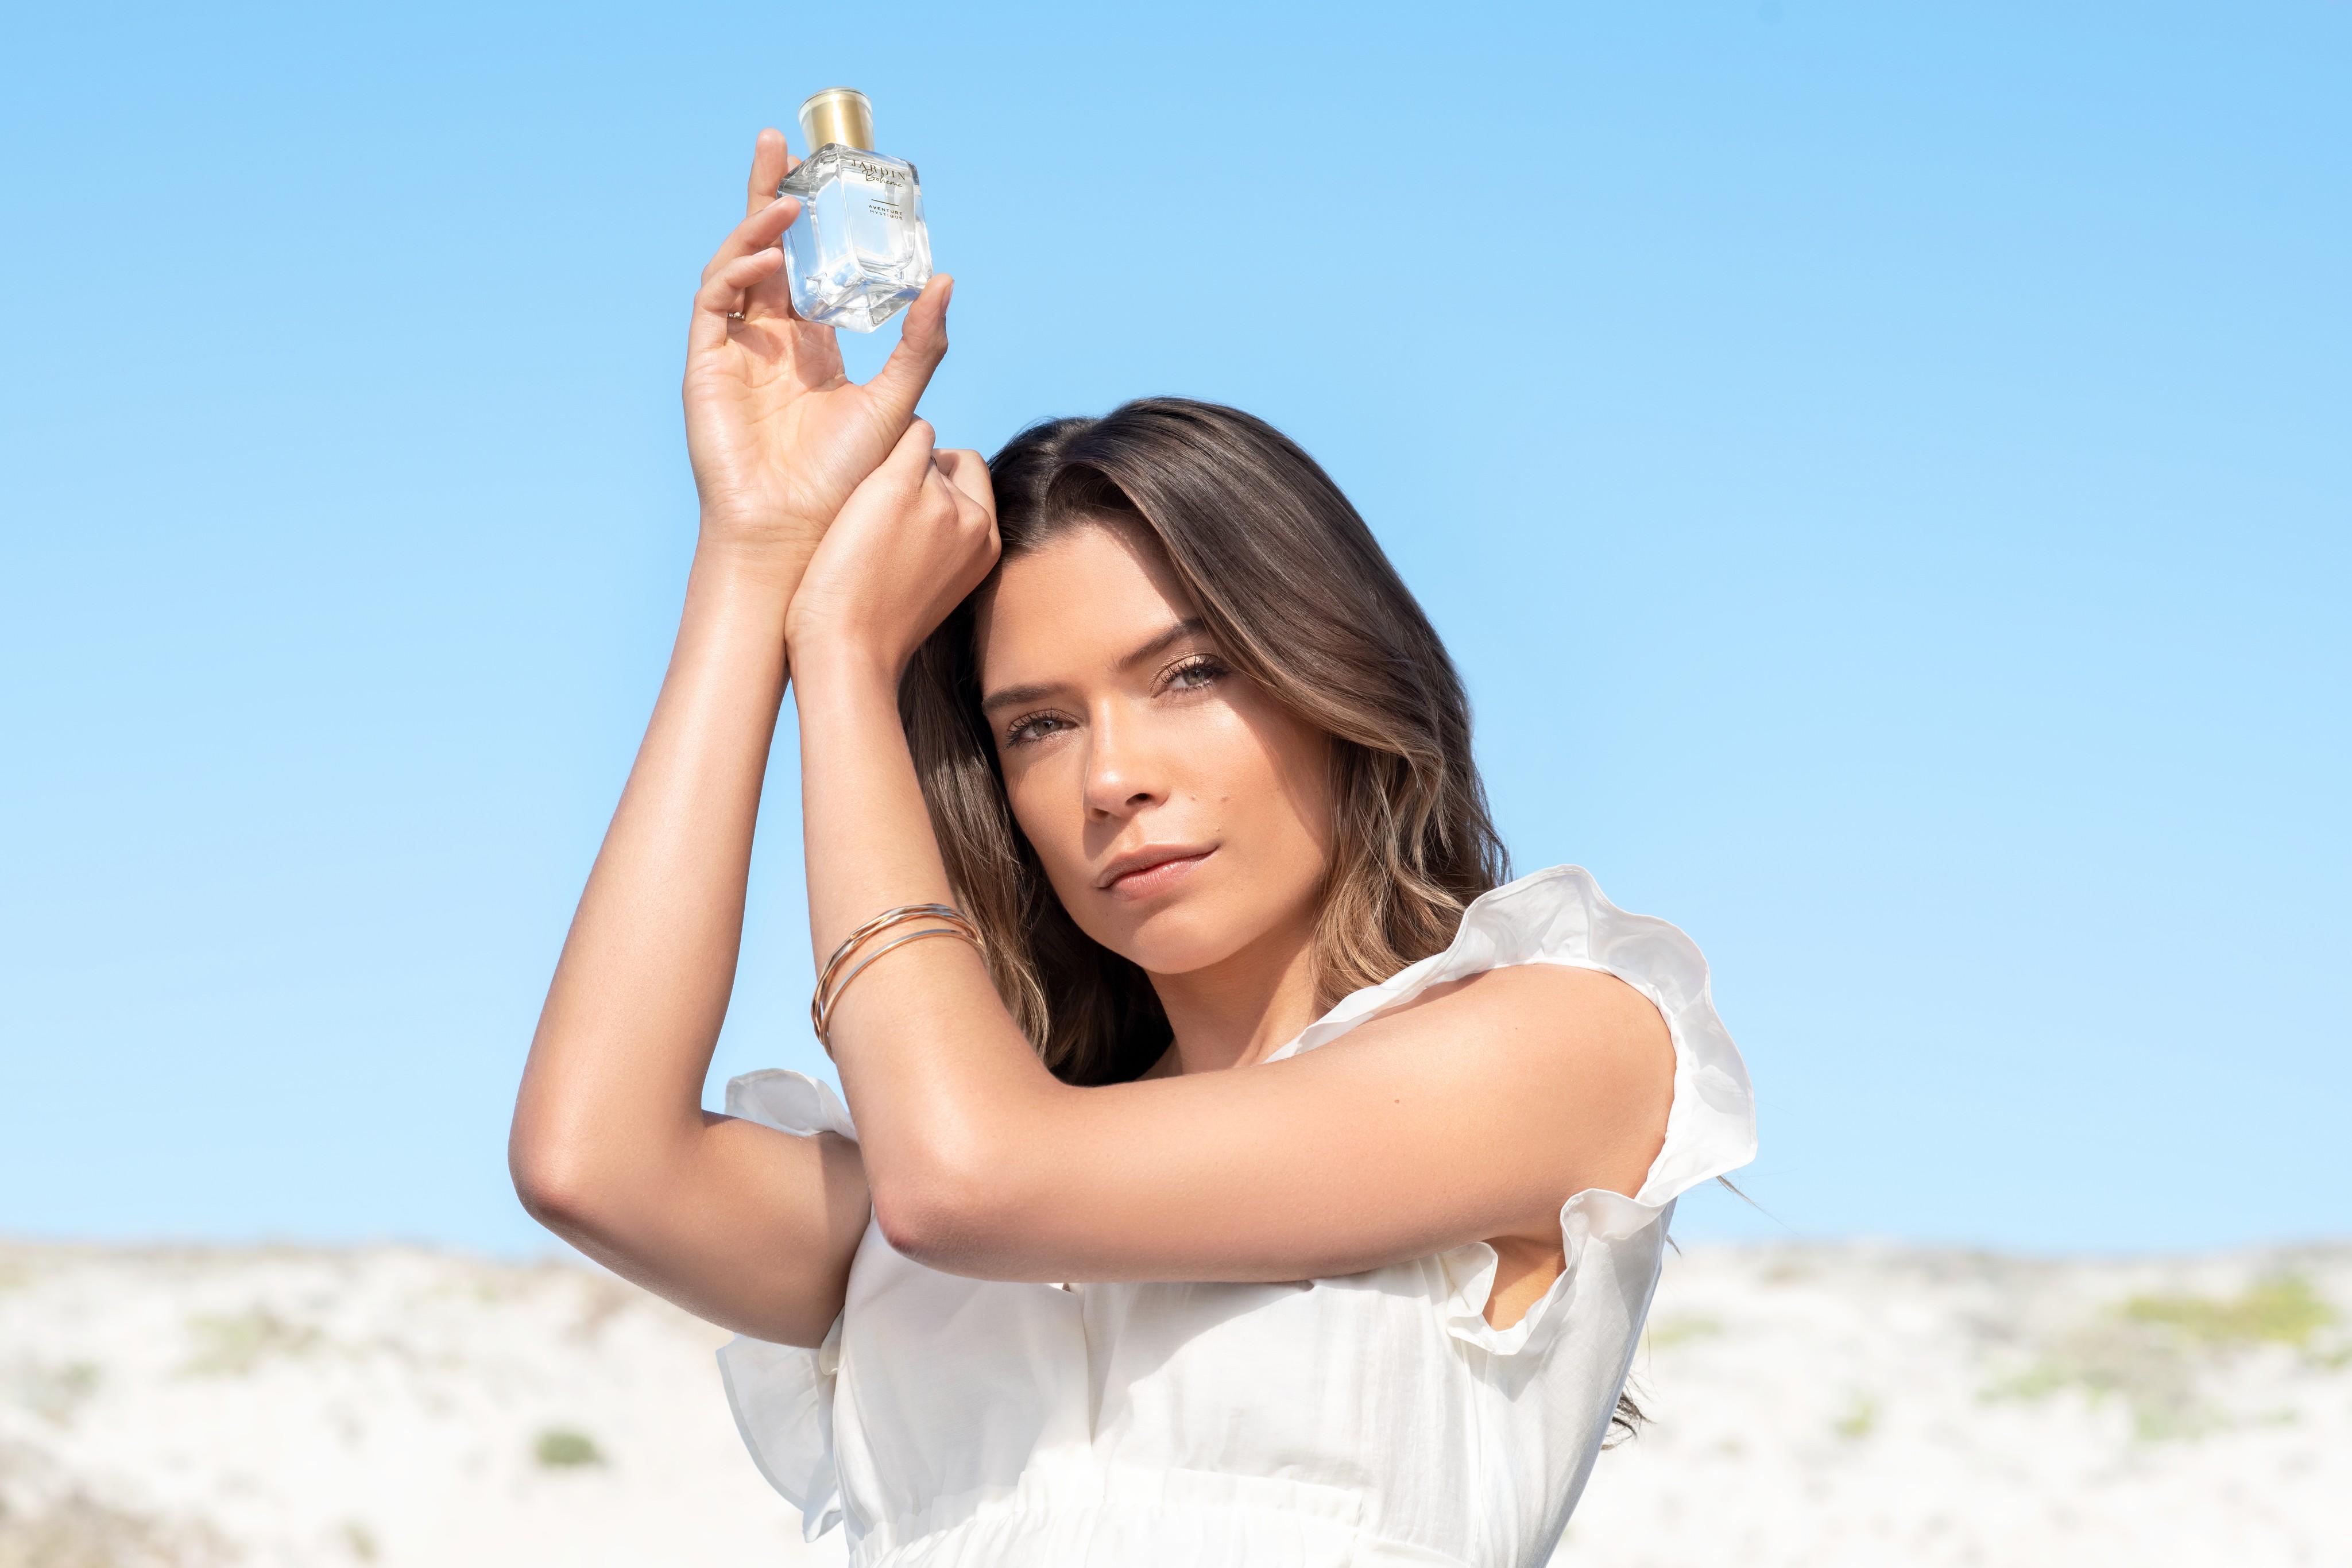 Fragrance-beautyvisual-woman-holding-perfume-bottle-v1-072022-Web-Rendition